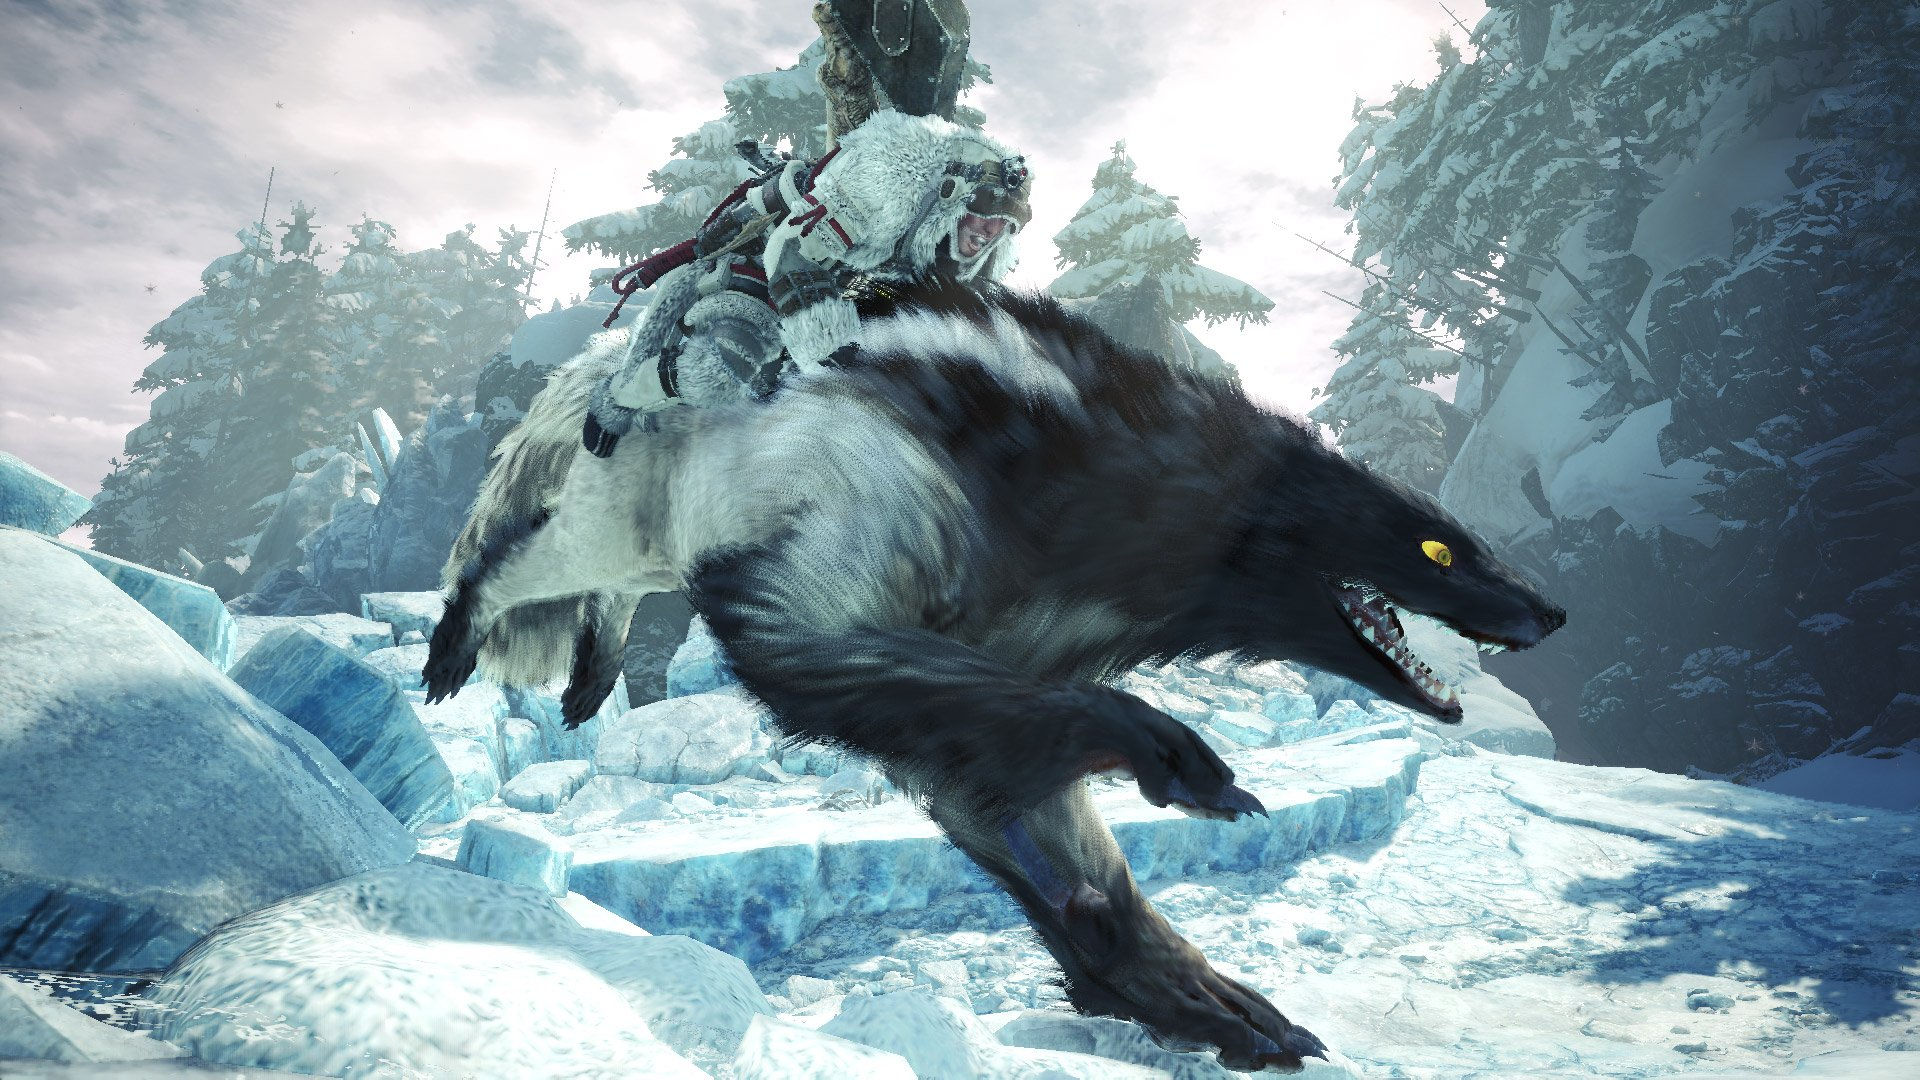 Riding a Wulg in Monster Hunter World: Iceborne